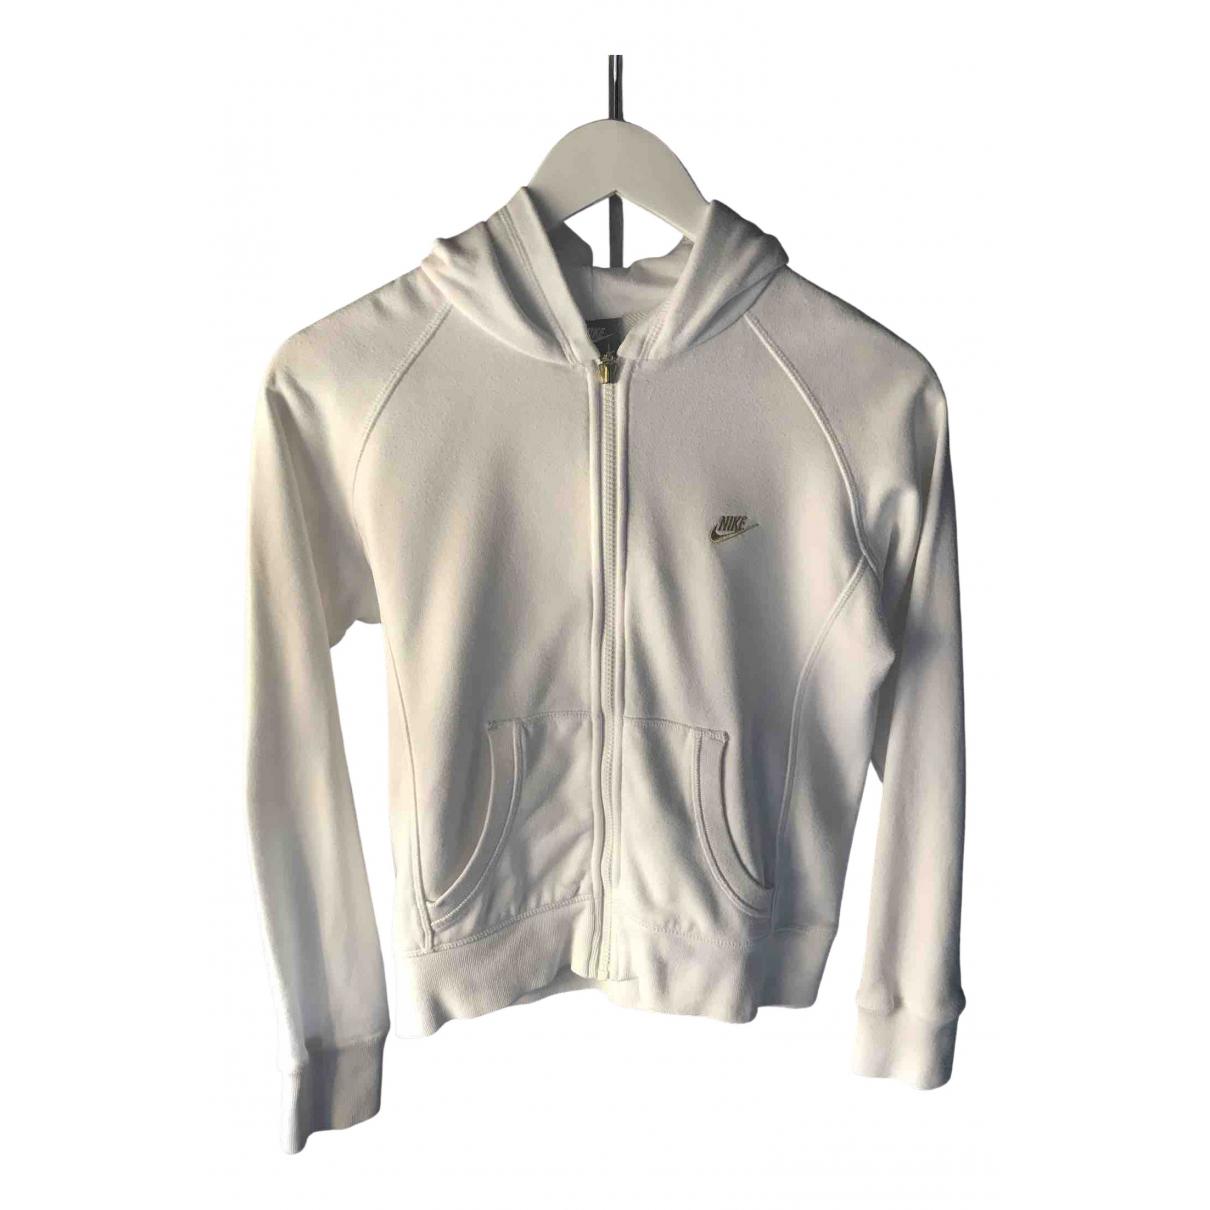 Nike N White Cotton Knitwear for Kids 12 years - XS FR